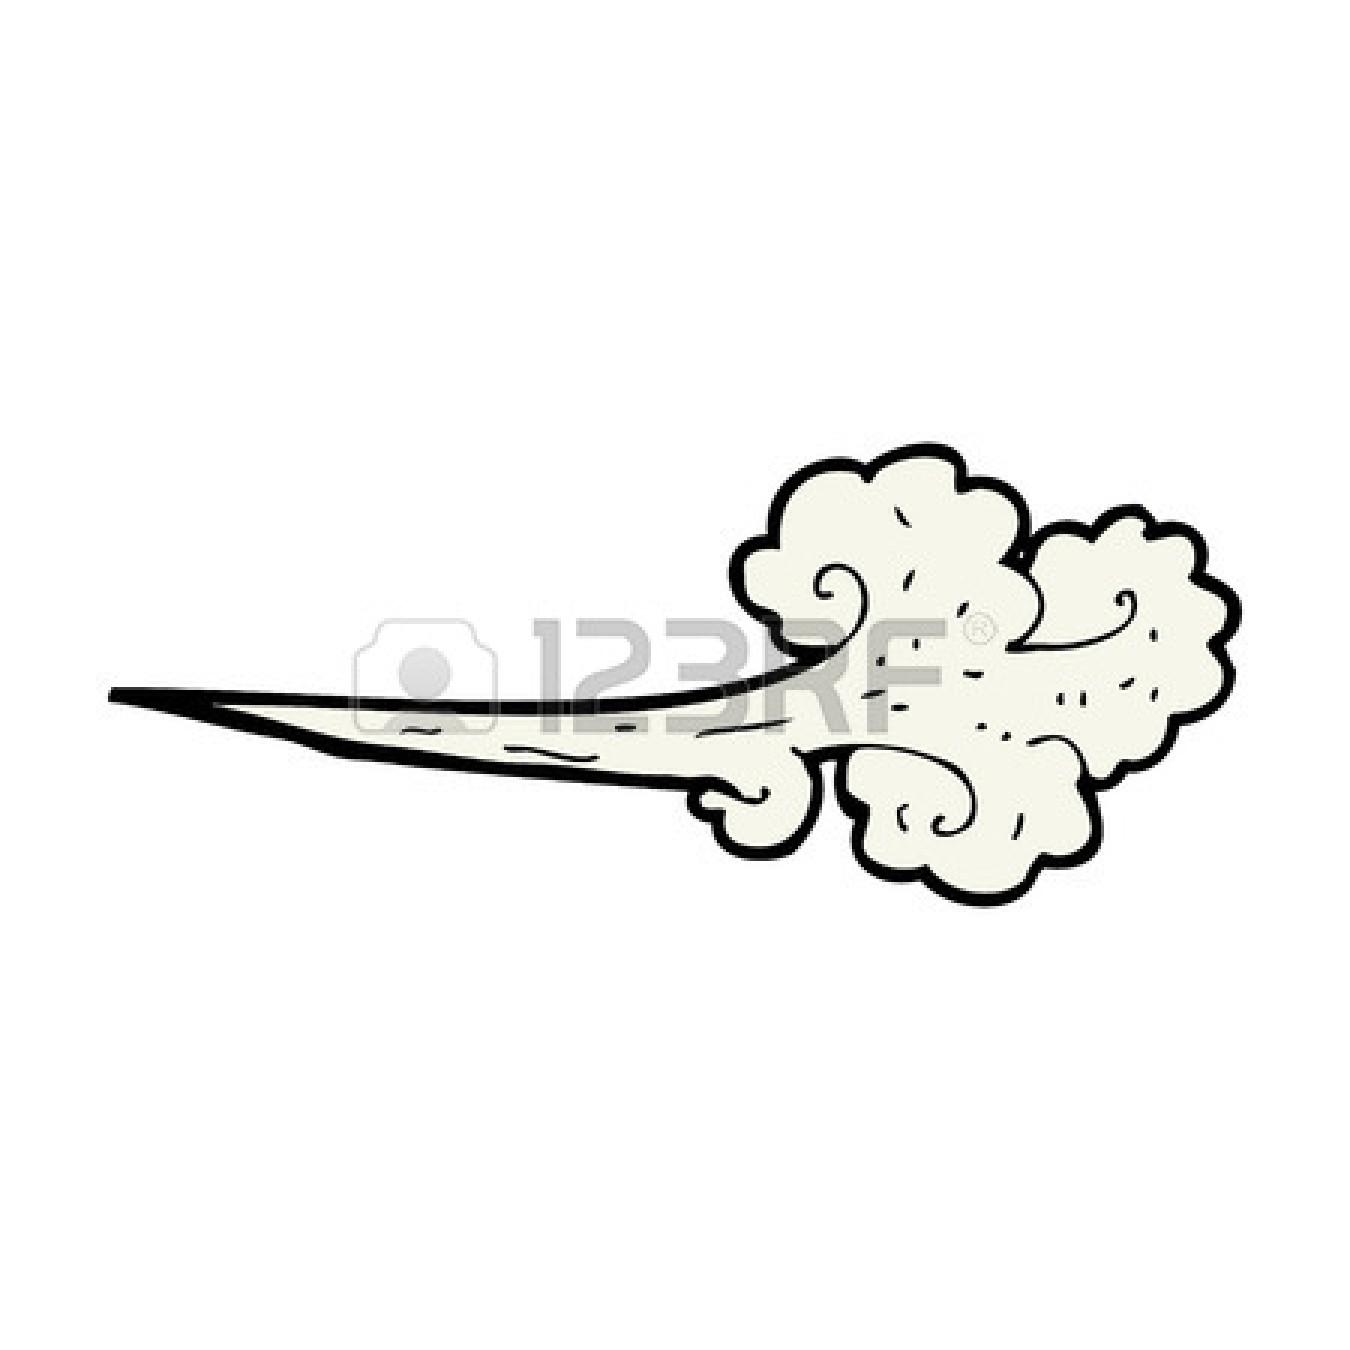 Wind clipart wind blowing Clipart 65 wind Wind art